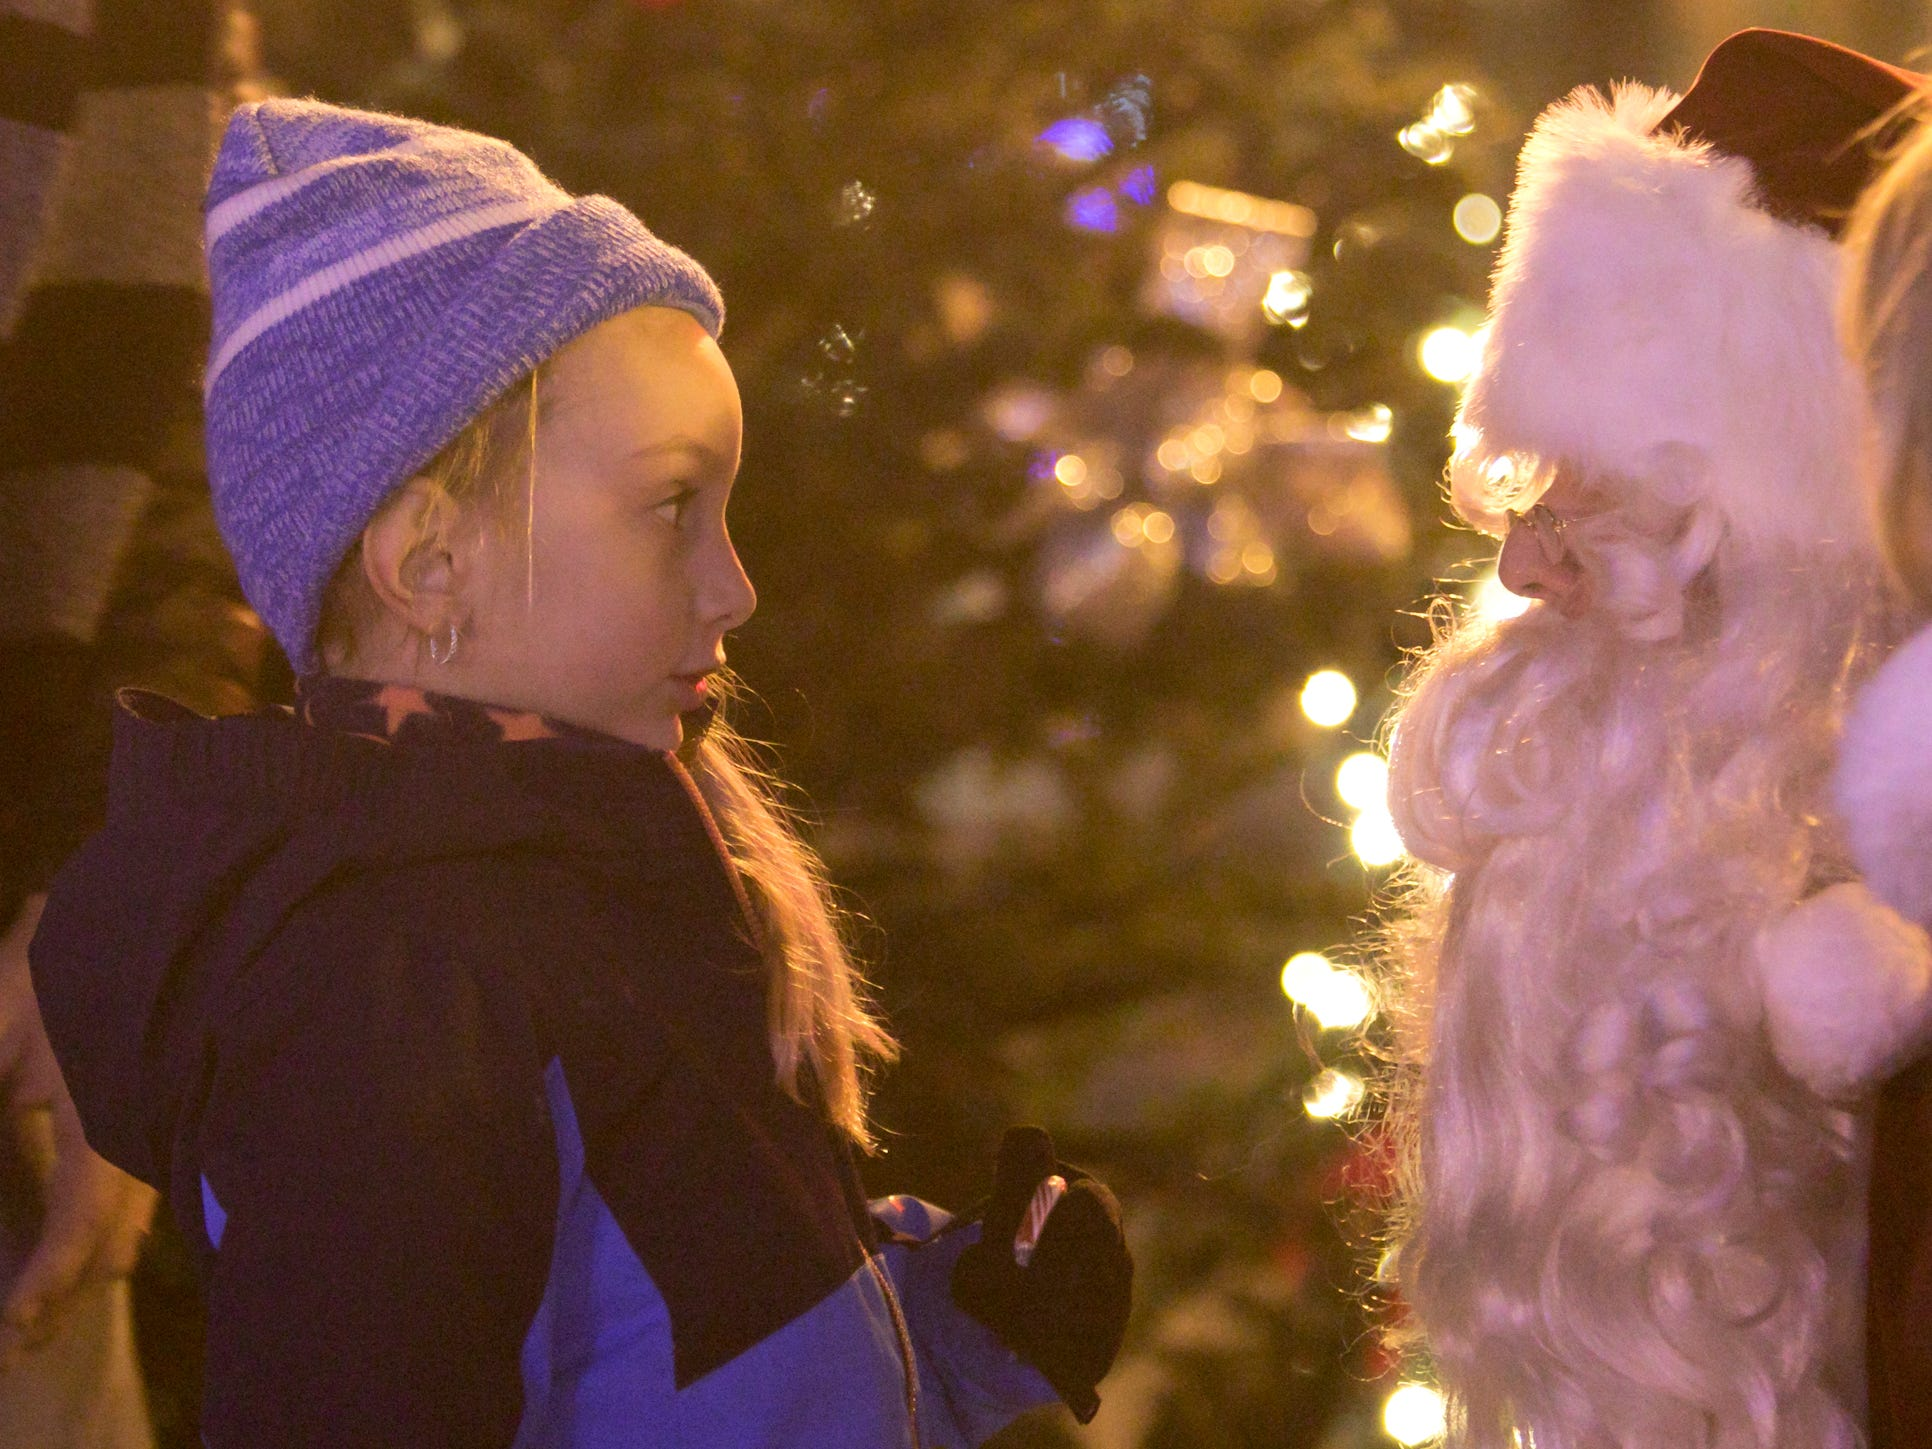 5-year-old Charlotte Cheresko tells Santa her wishes for Christmas at Brighton's Holiday Glow Saturday, Nov. 17, 2018.